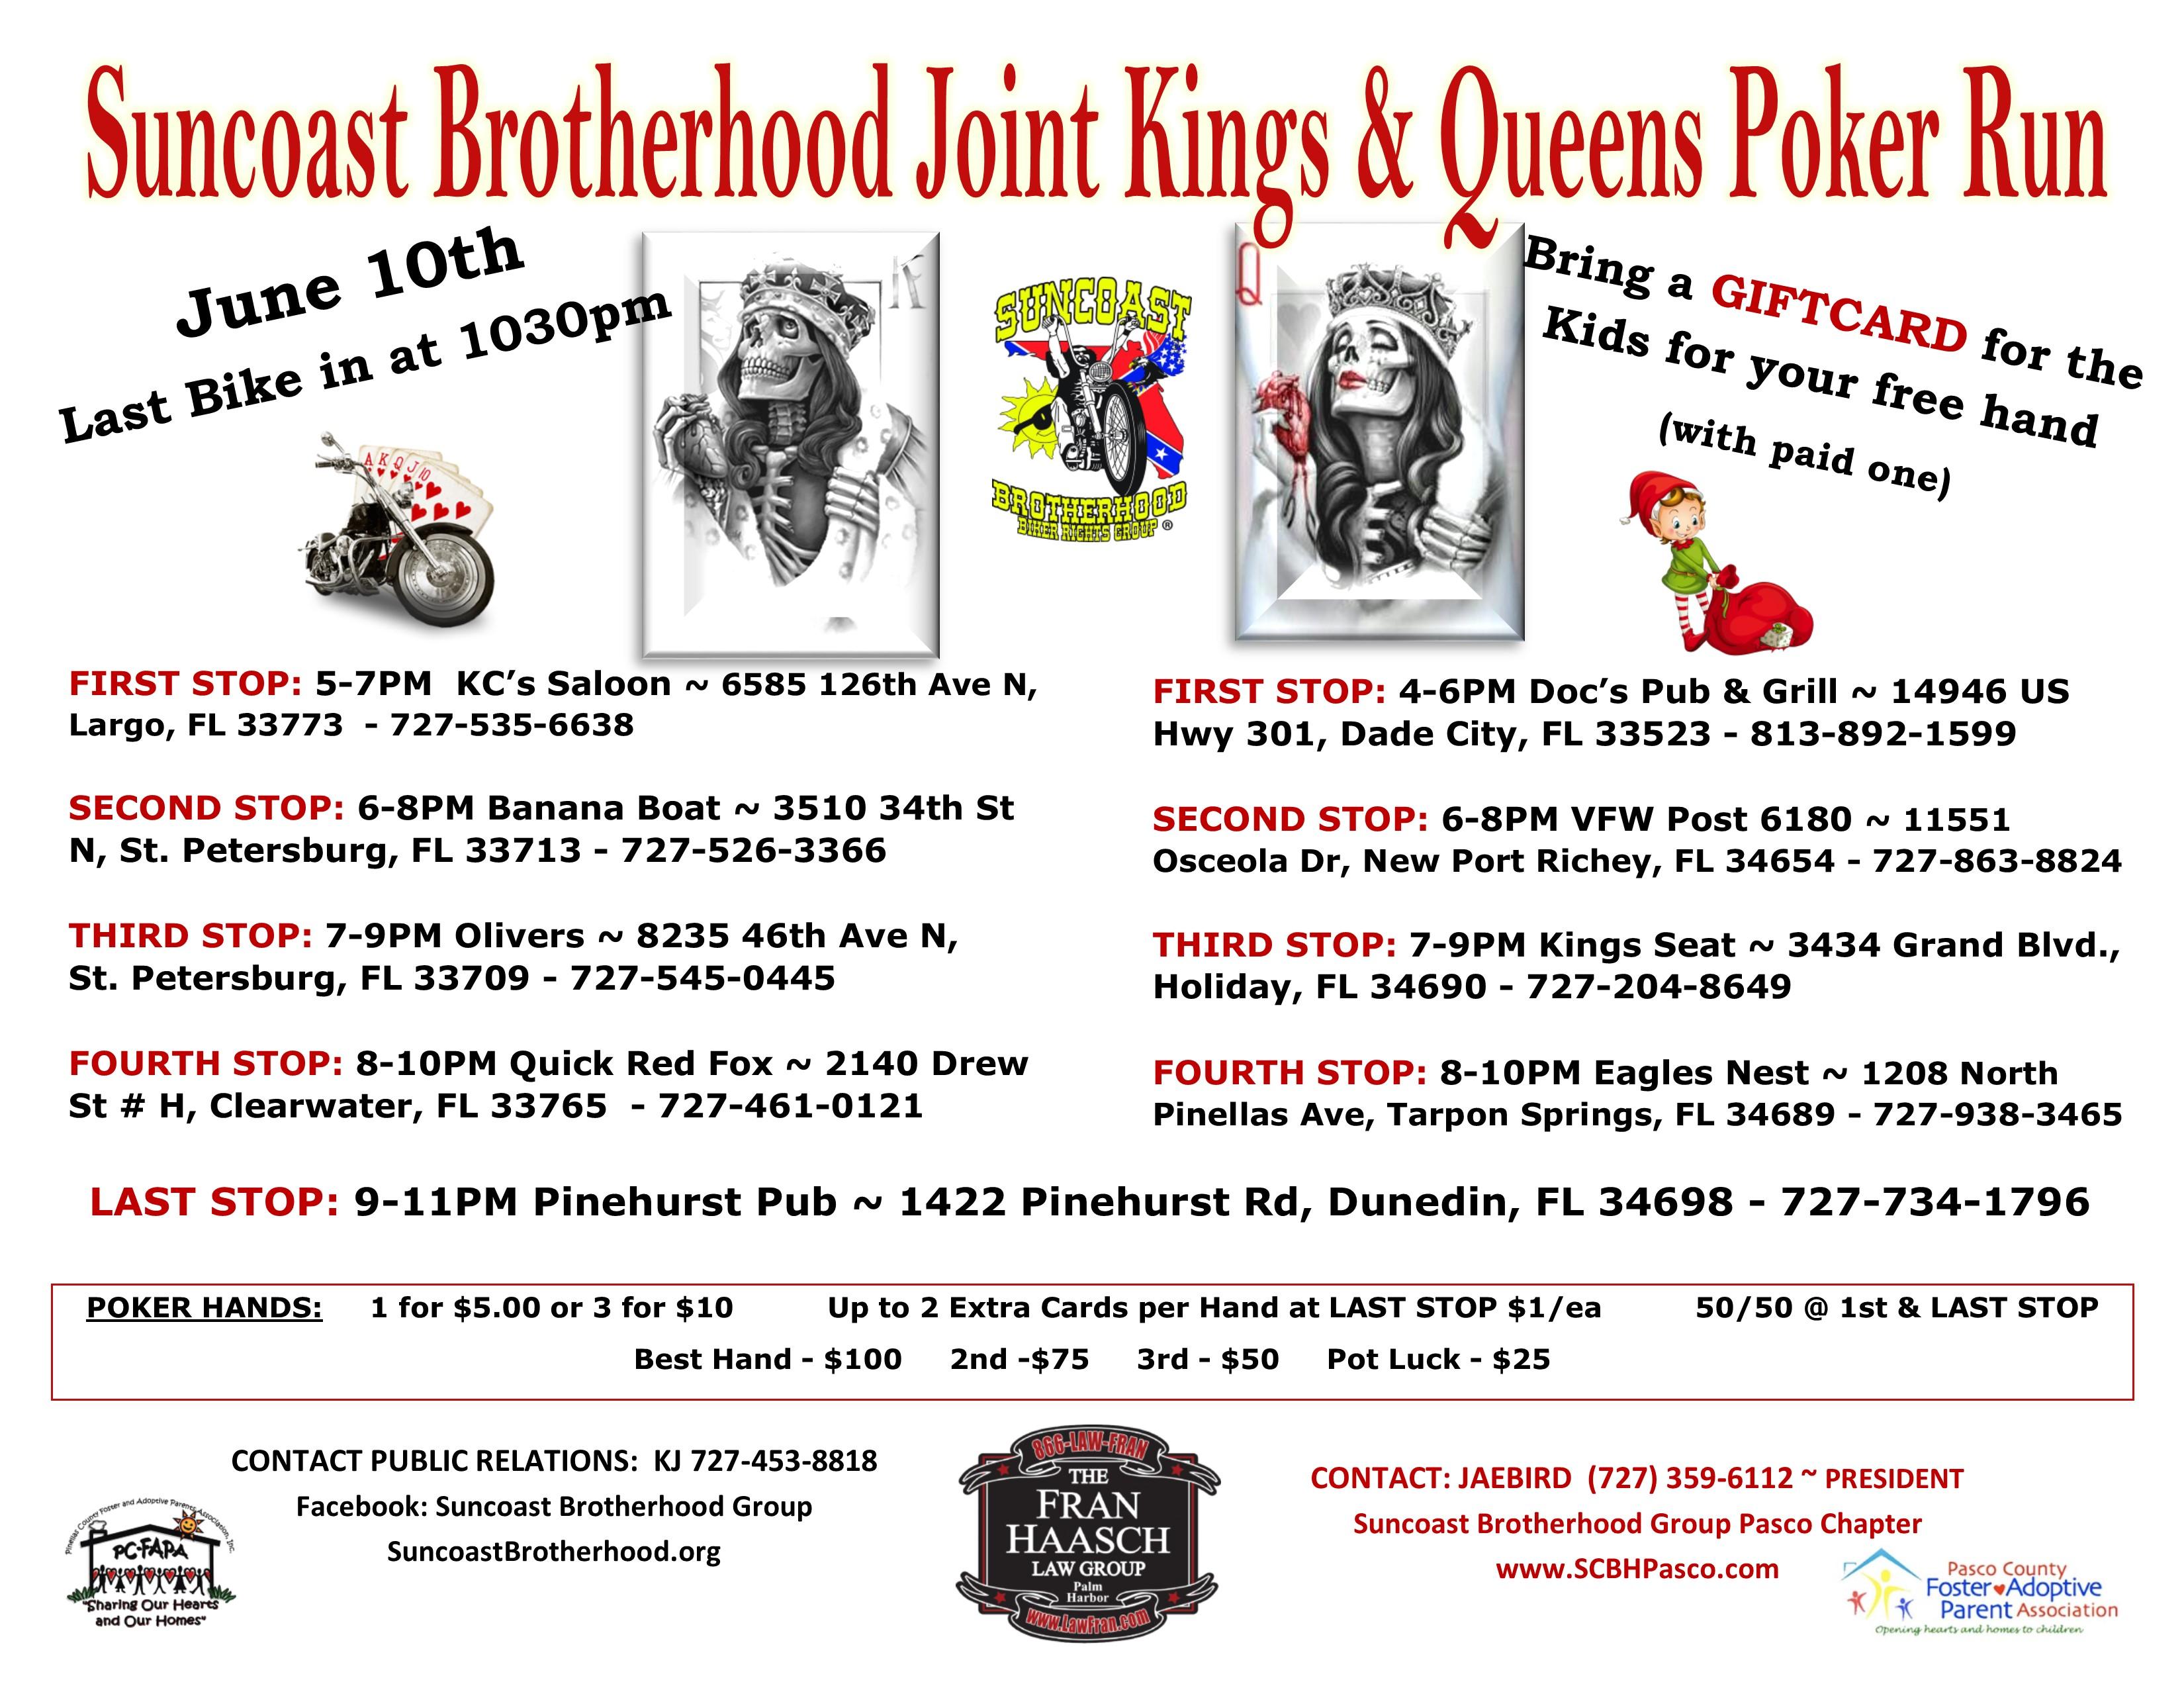 Suncoast Brotherhood Joint Kings & Queens Poker Run